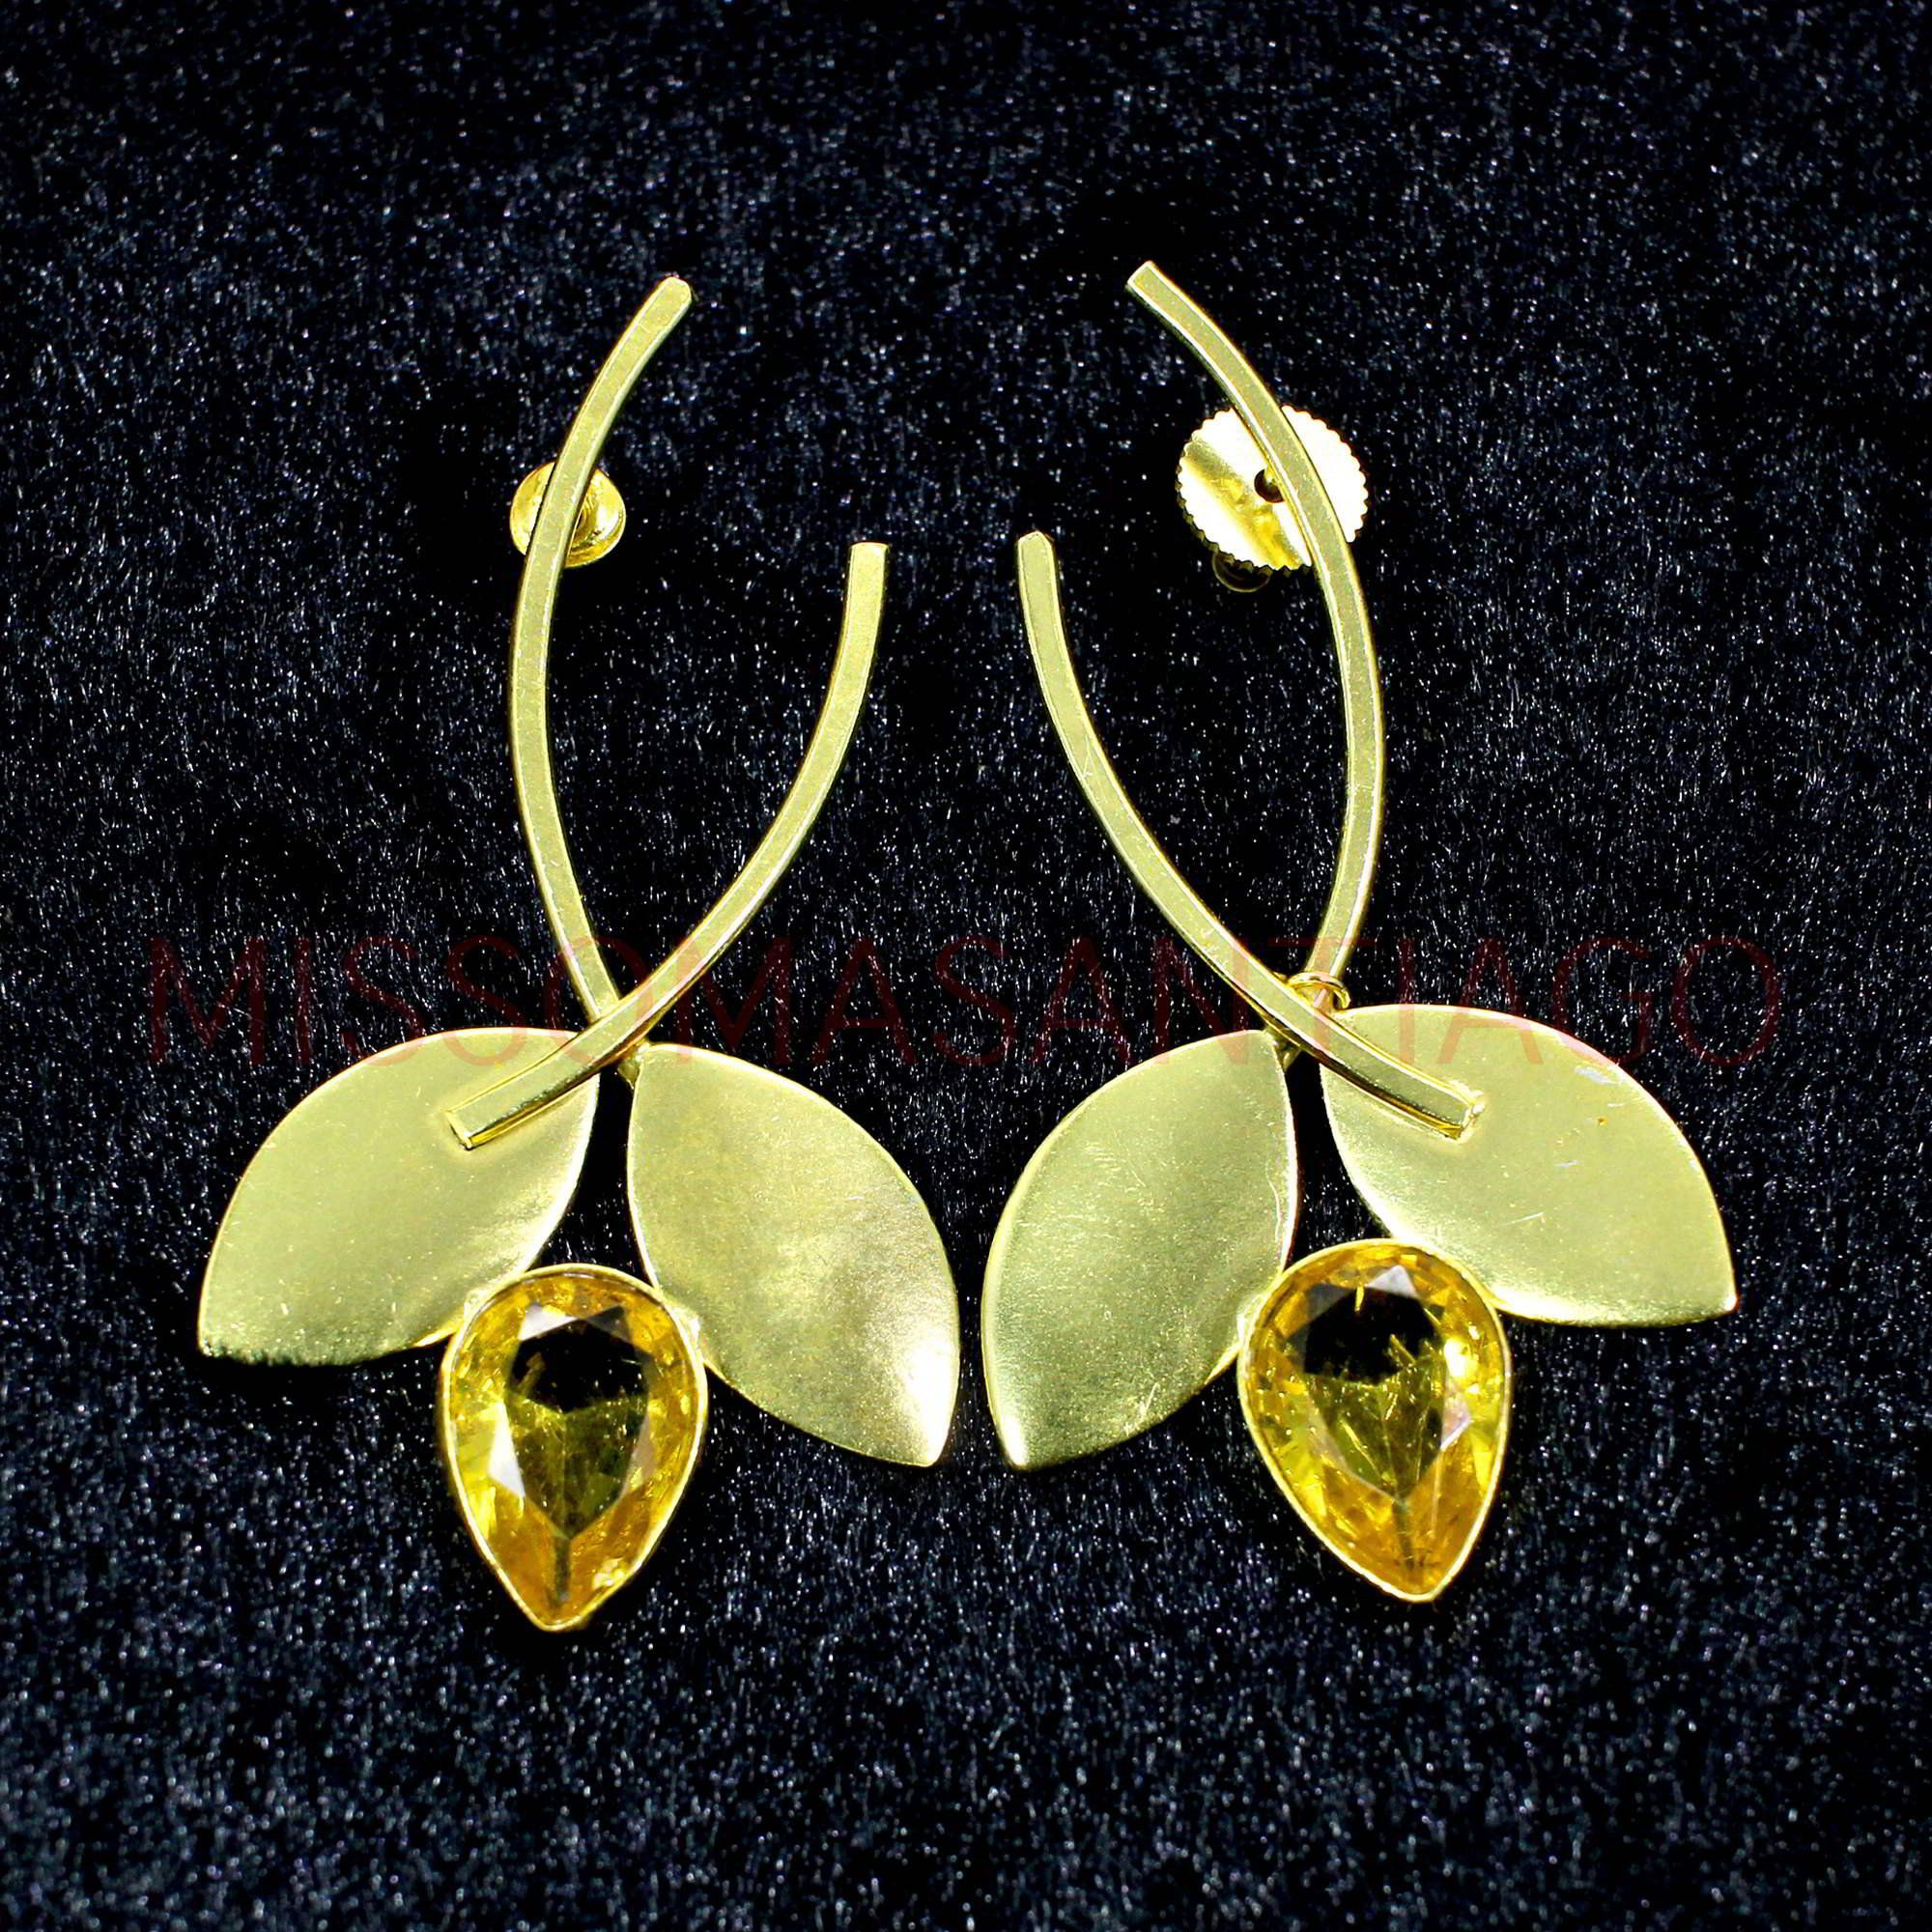 Gift Gold Plated Brass Jewelry Handmade Earrings With Stone Indian Jewelry Blue Stone Earrings Blue Quartz Earrings Textured Earrings